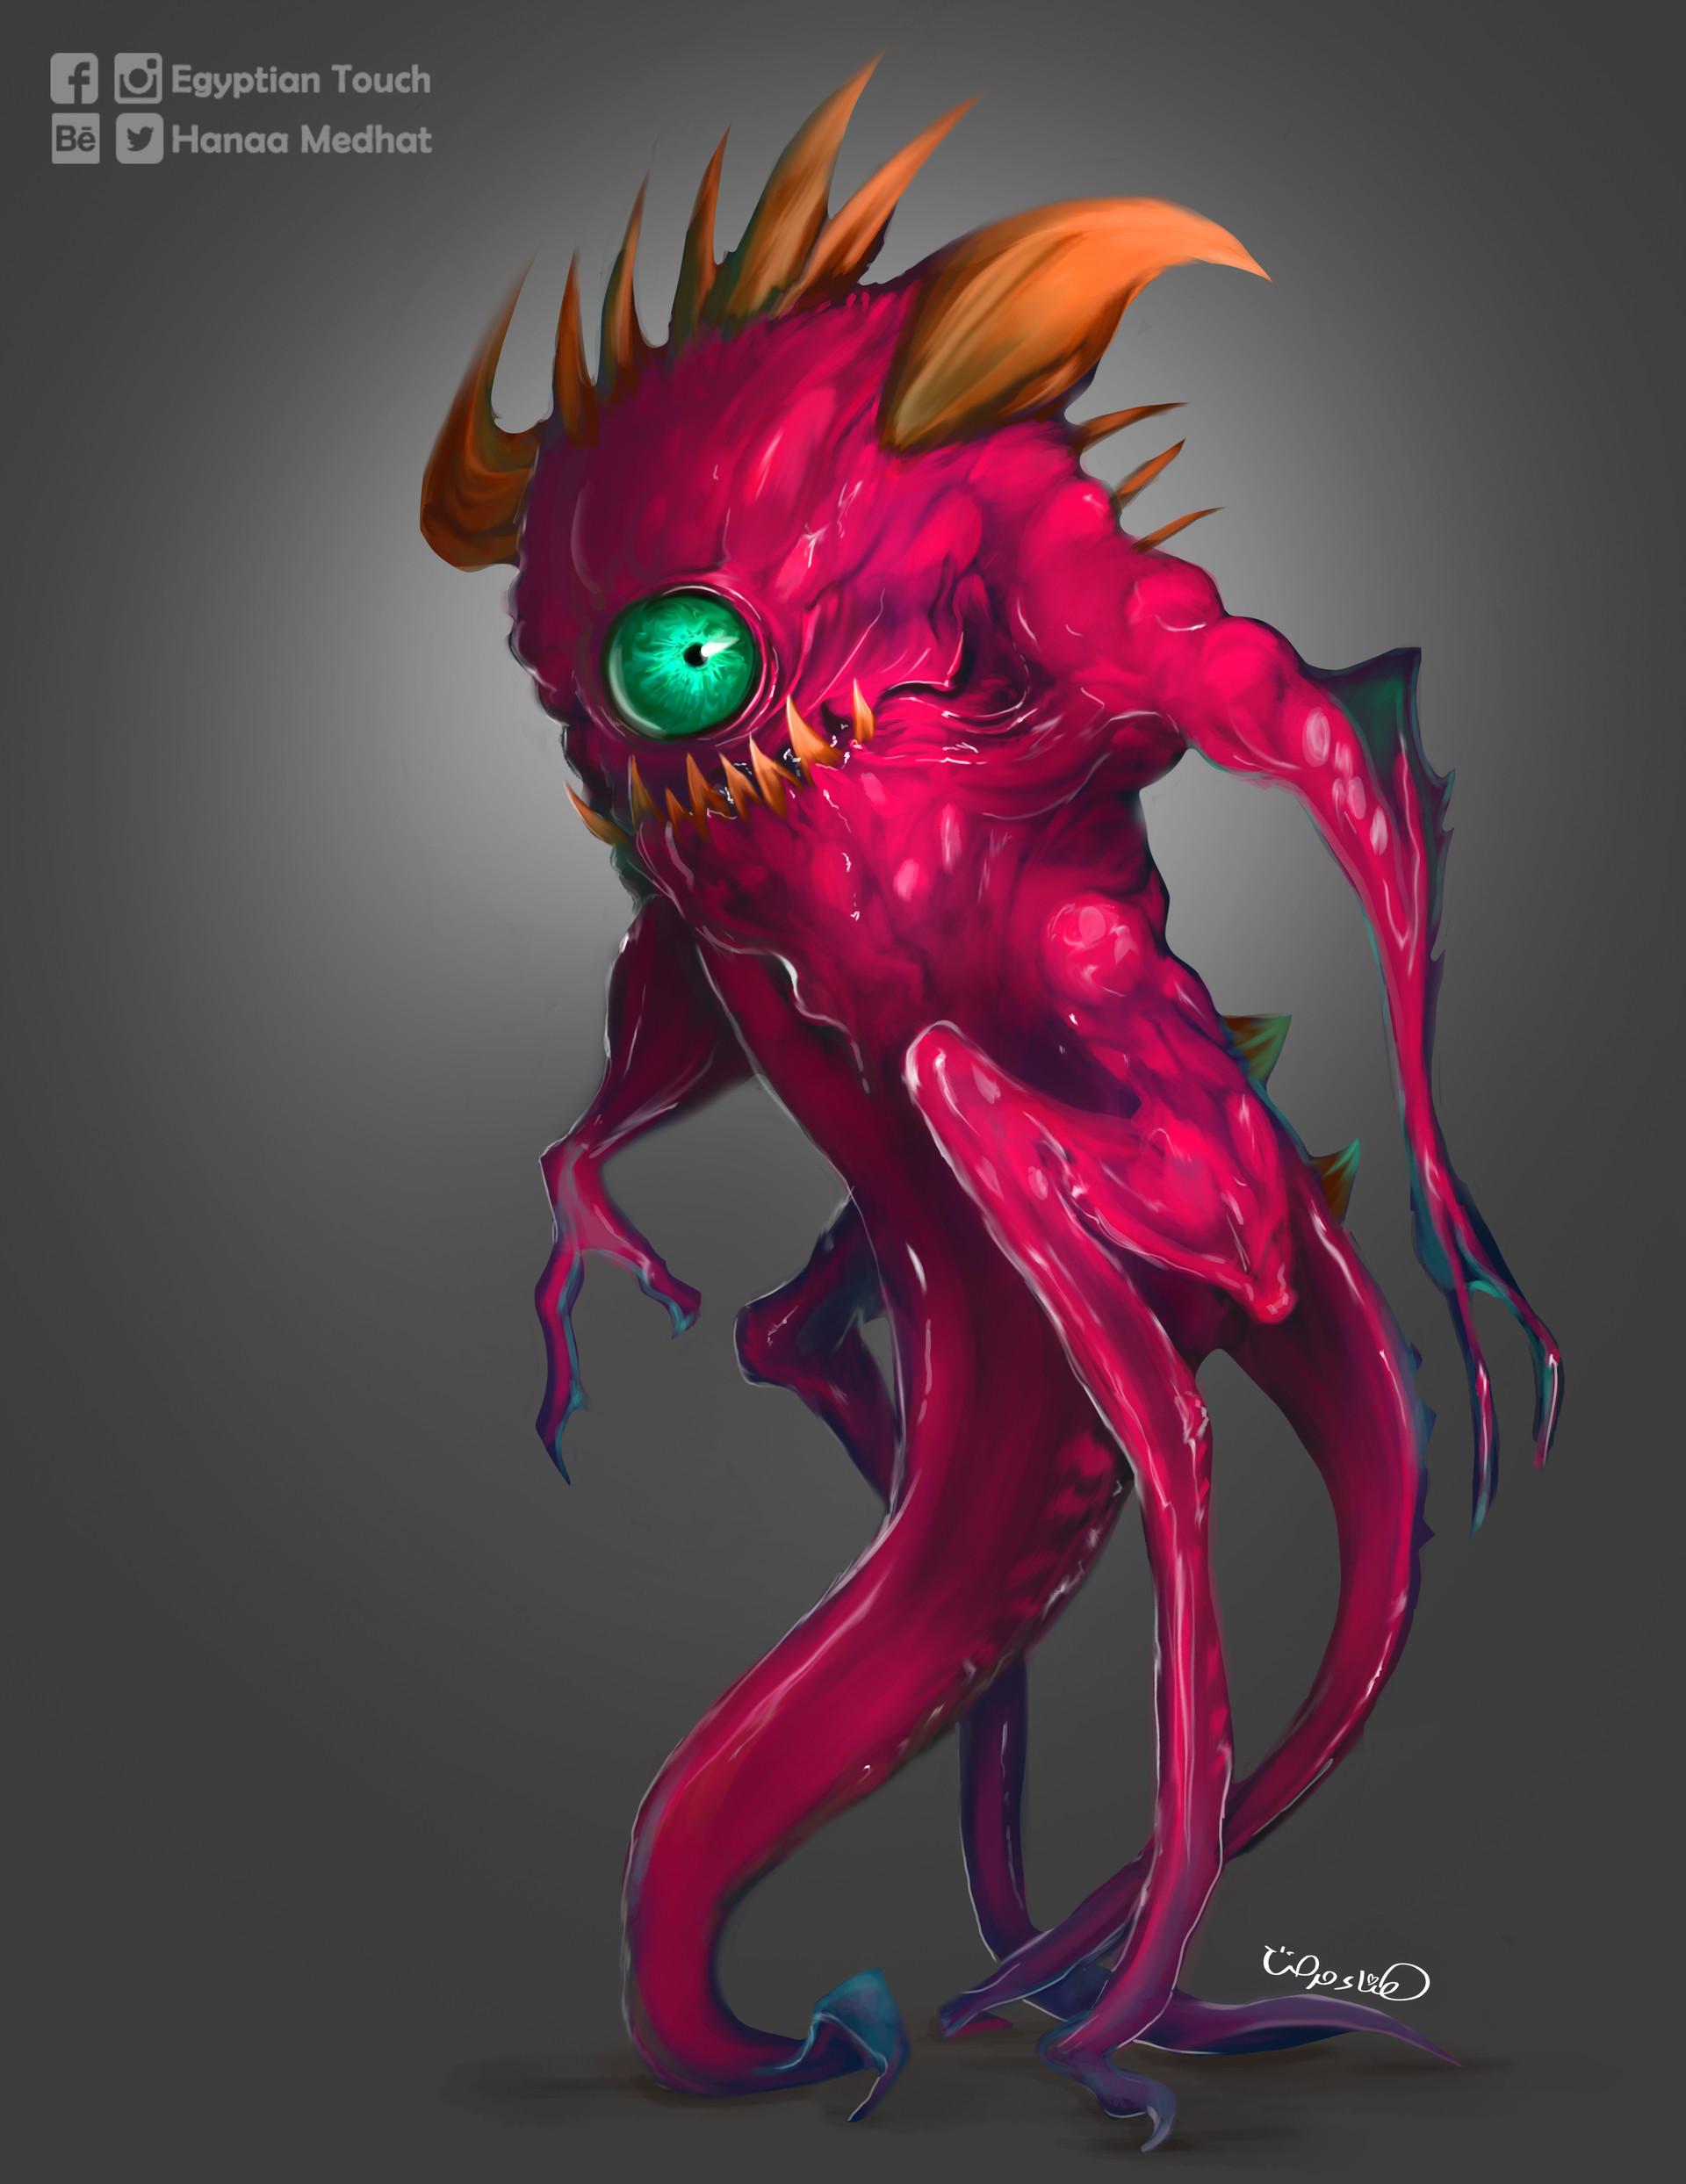 Hanaa medhat monster